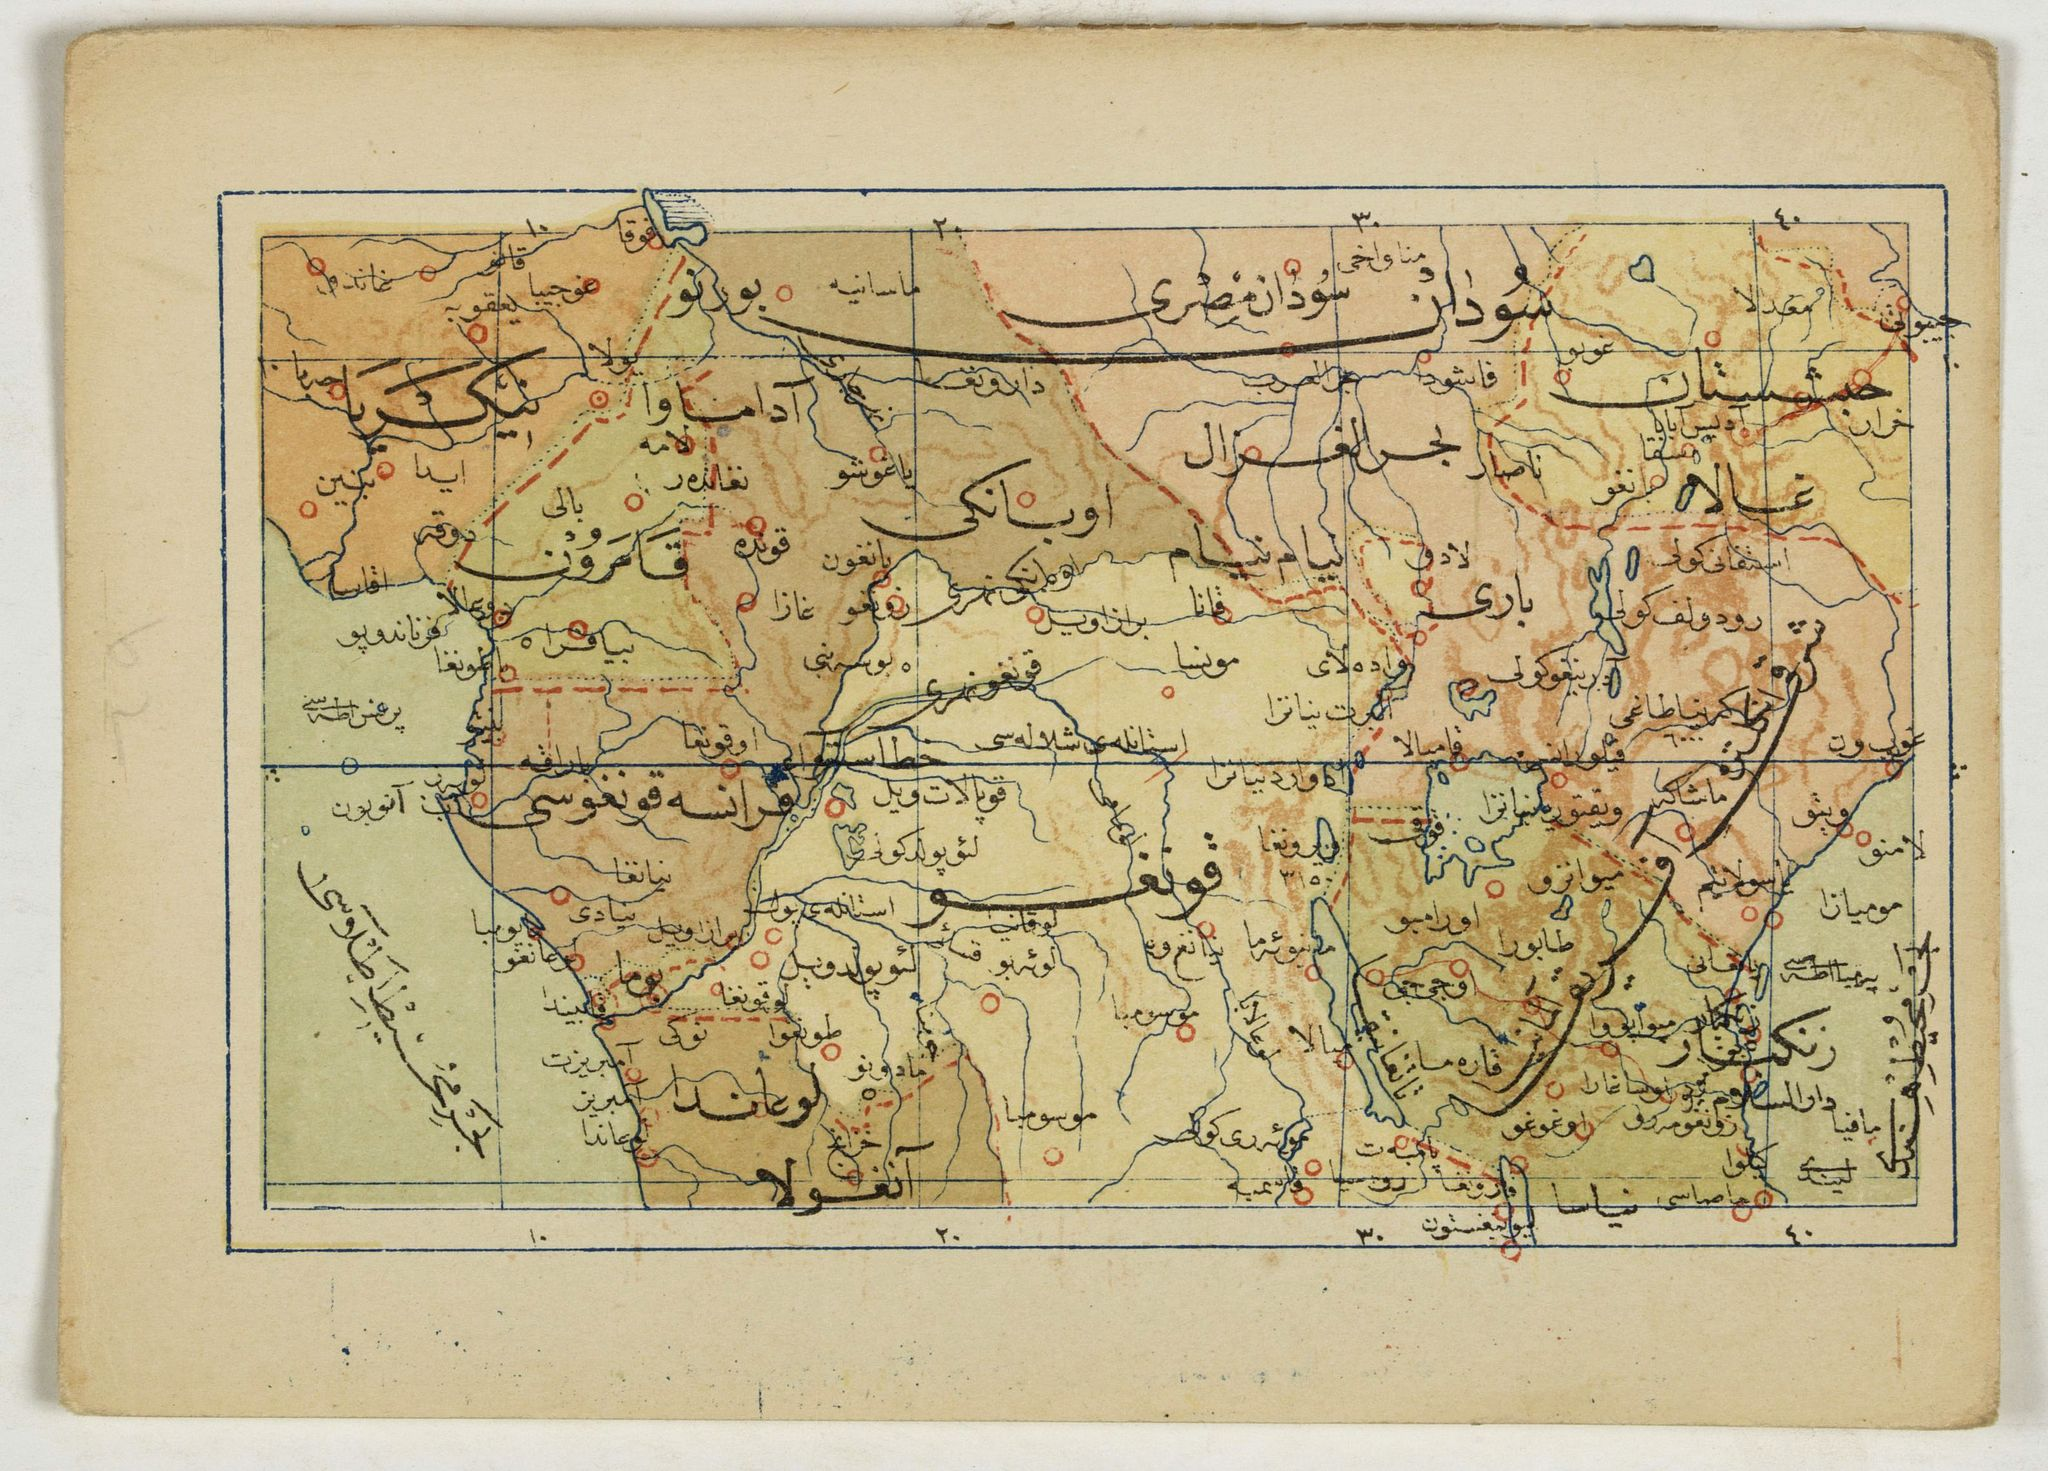 EŞREF, Mehmet -  [Equatorial Africa - map with Ottoman script]